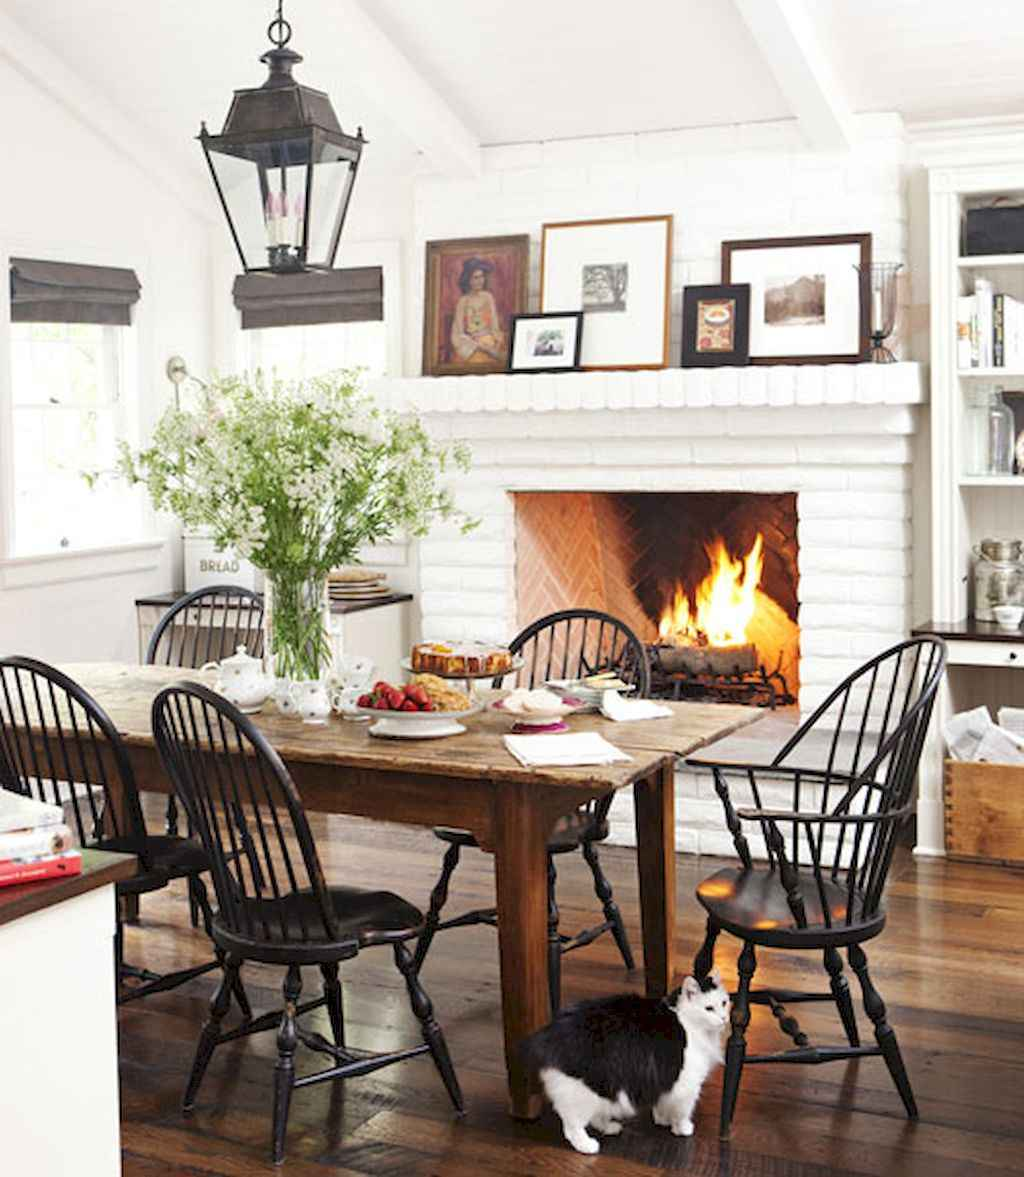 100 Rustic Farmhouse Dining Room Decor Ideas (32)